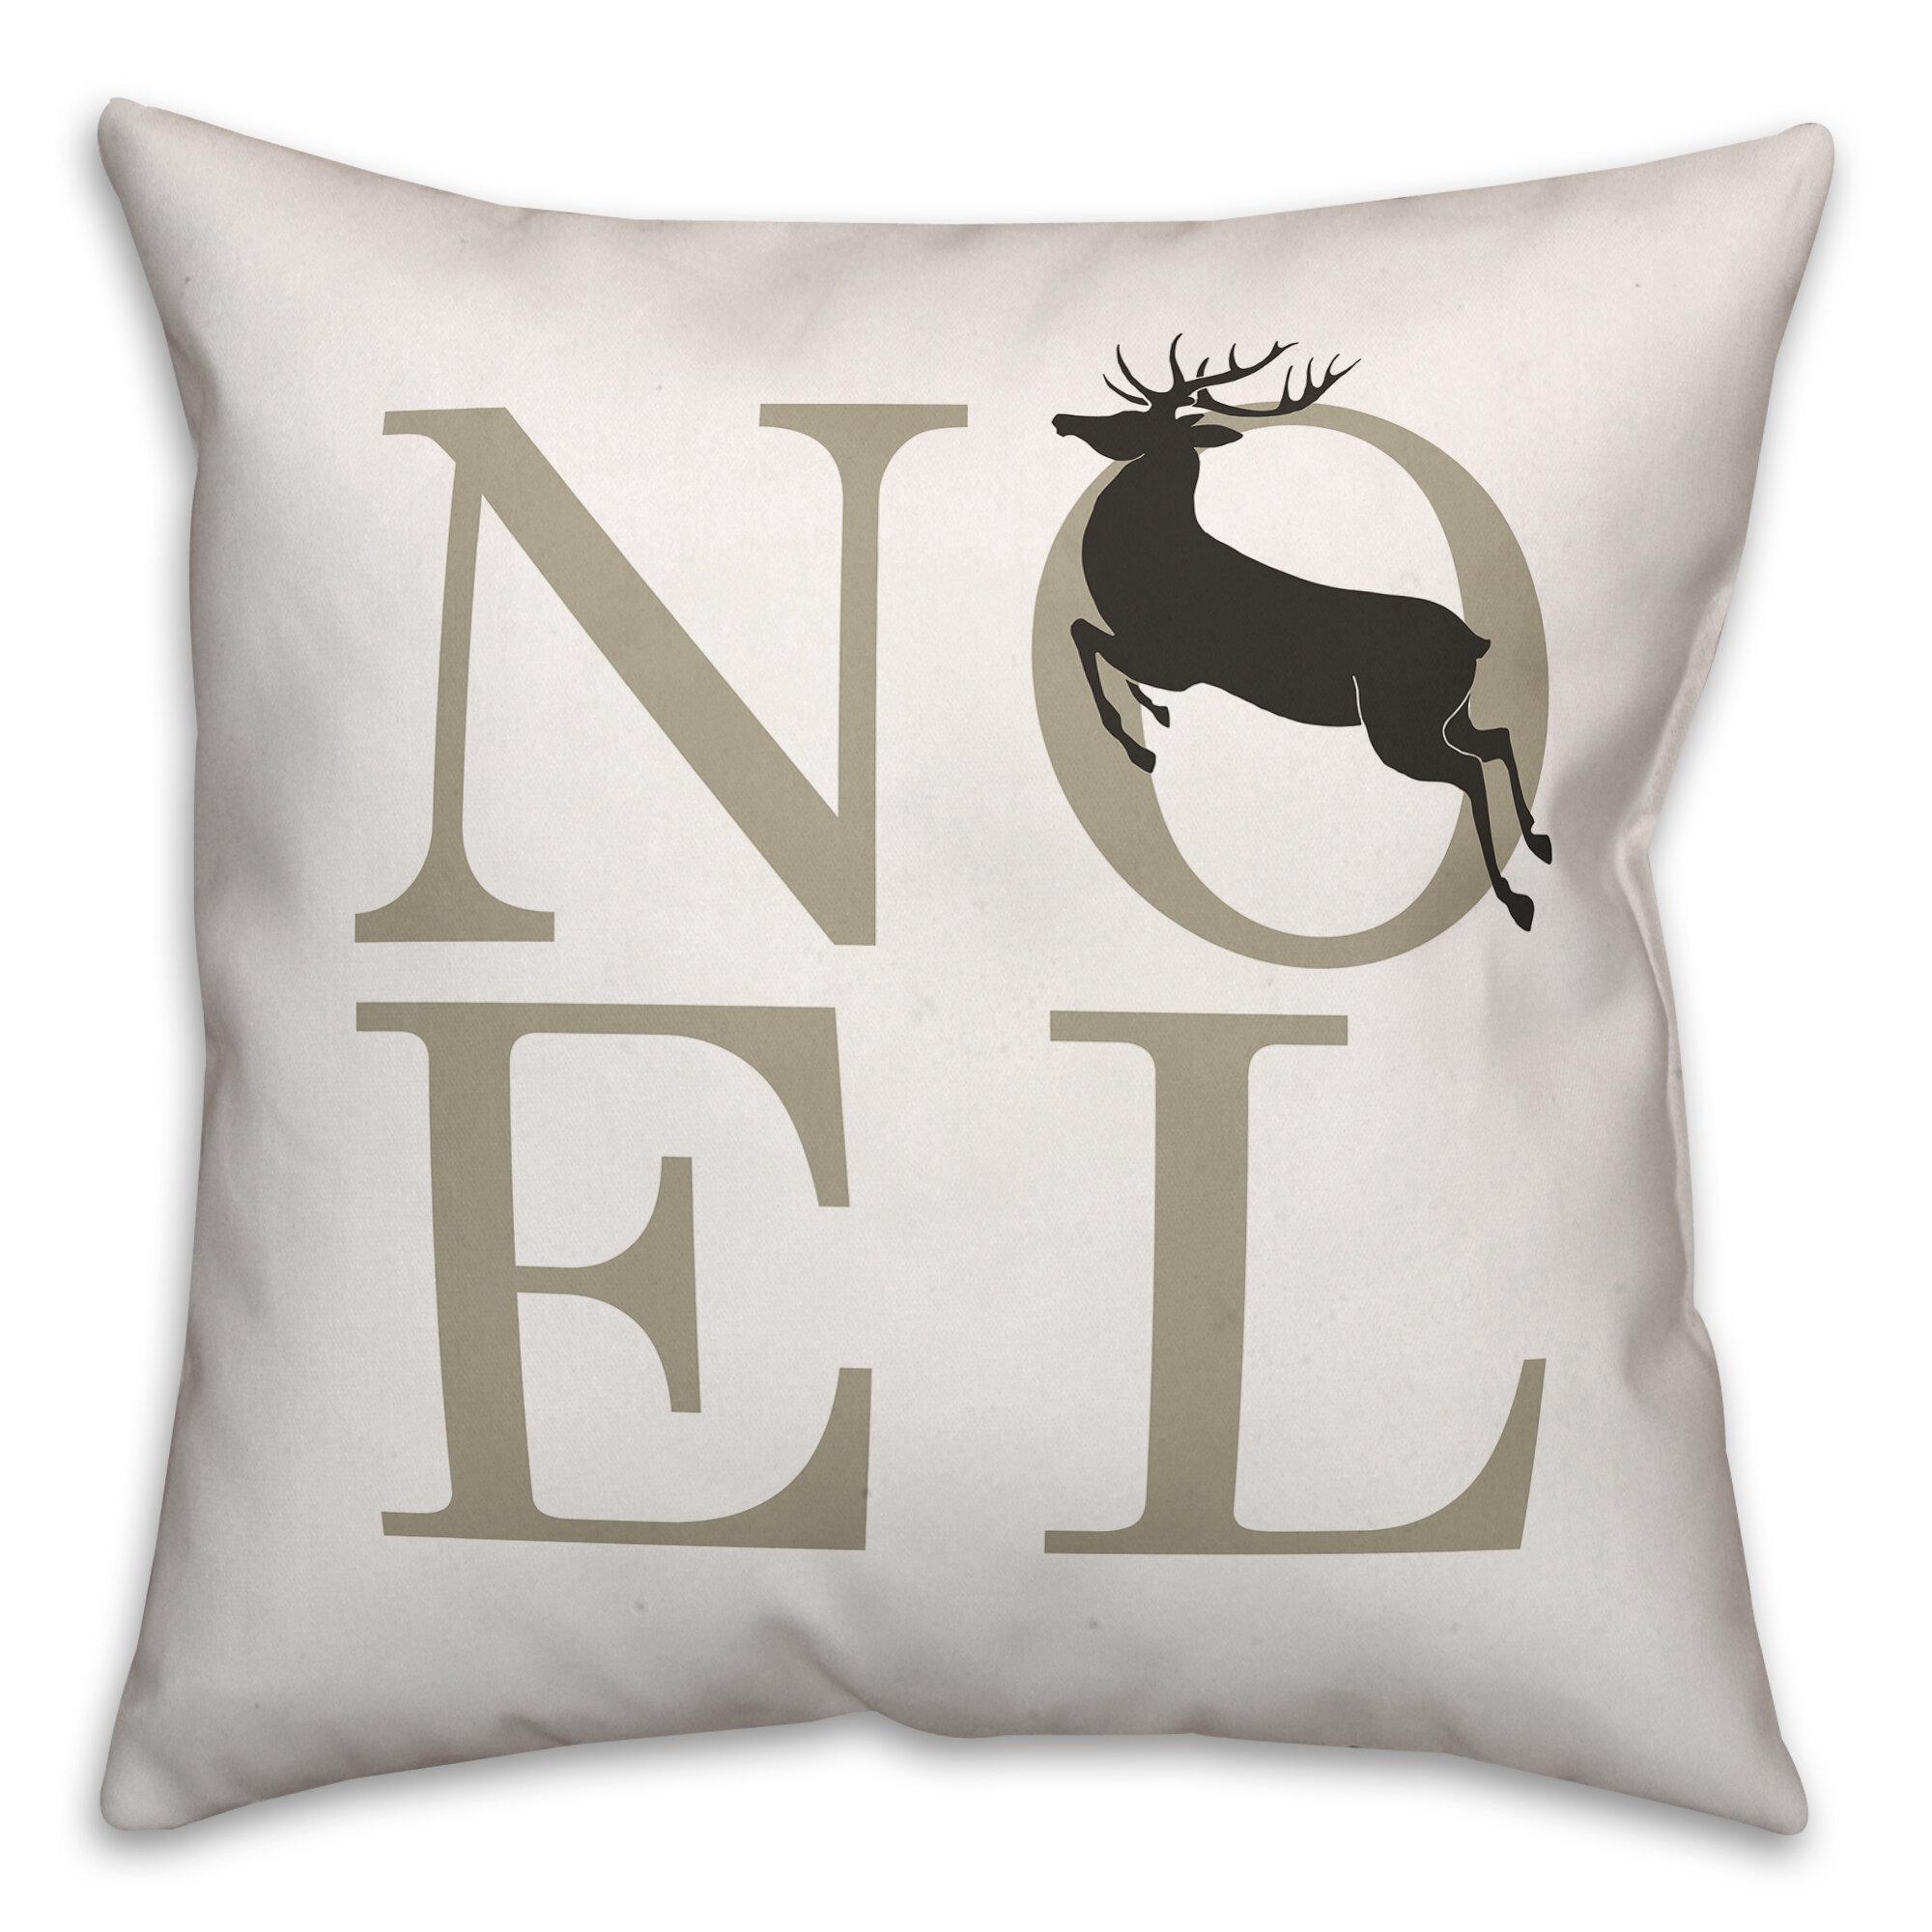 The Holiday Aisle Winthrop Noel Throw Pillow Wayfair